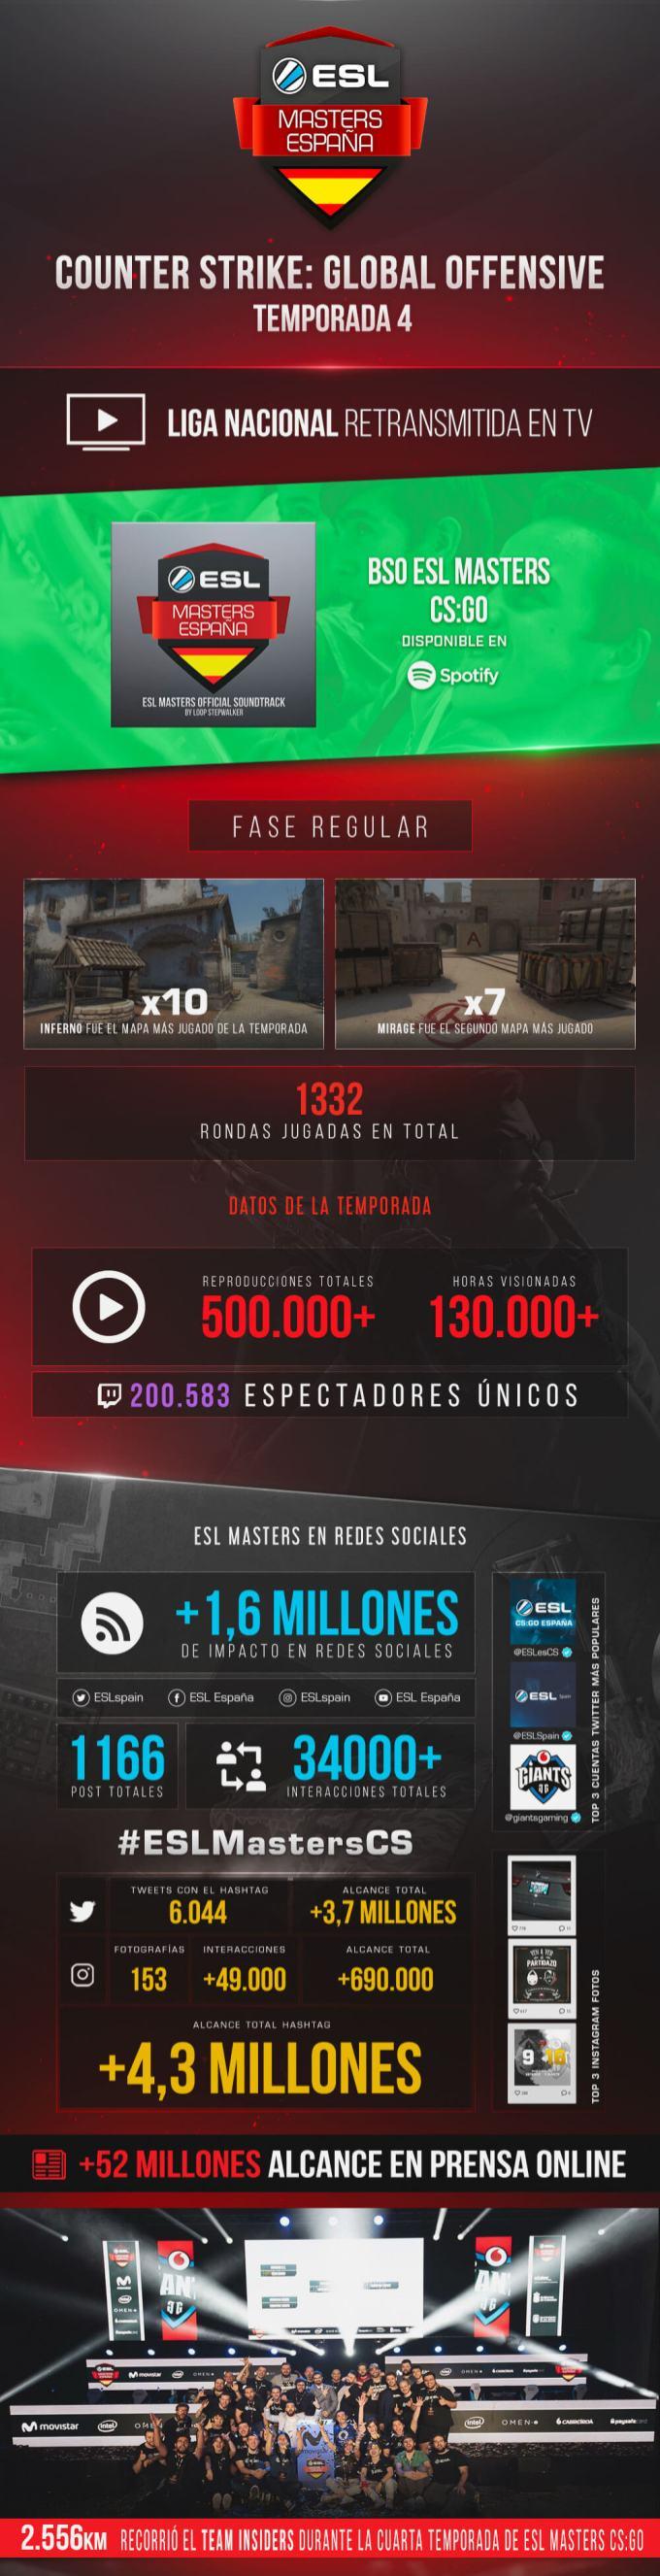 ESL Masters CSGO T4 - Infografía (1)